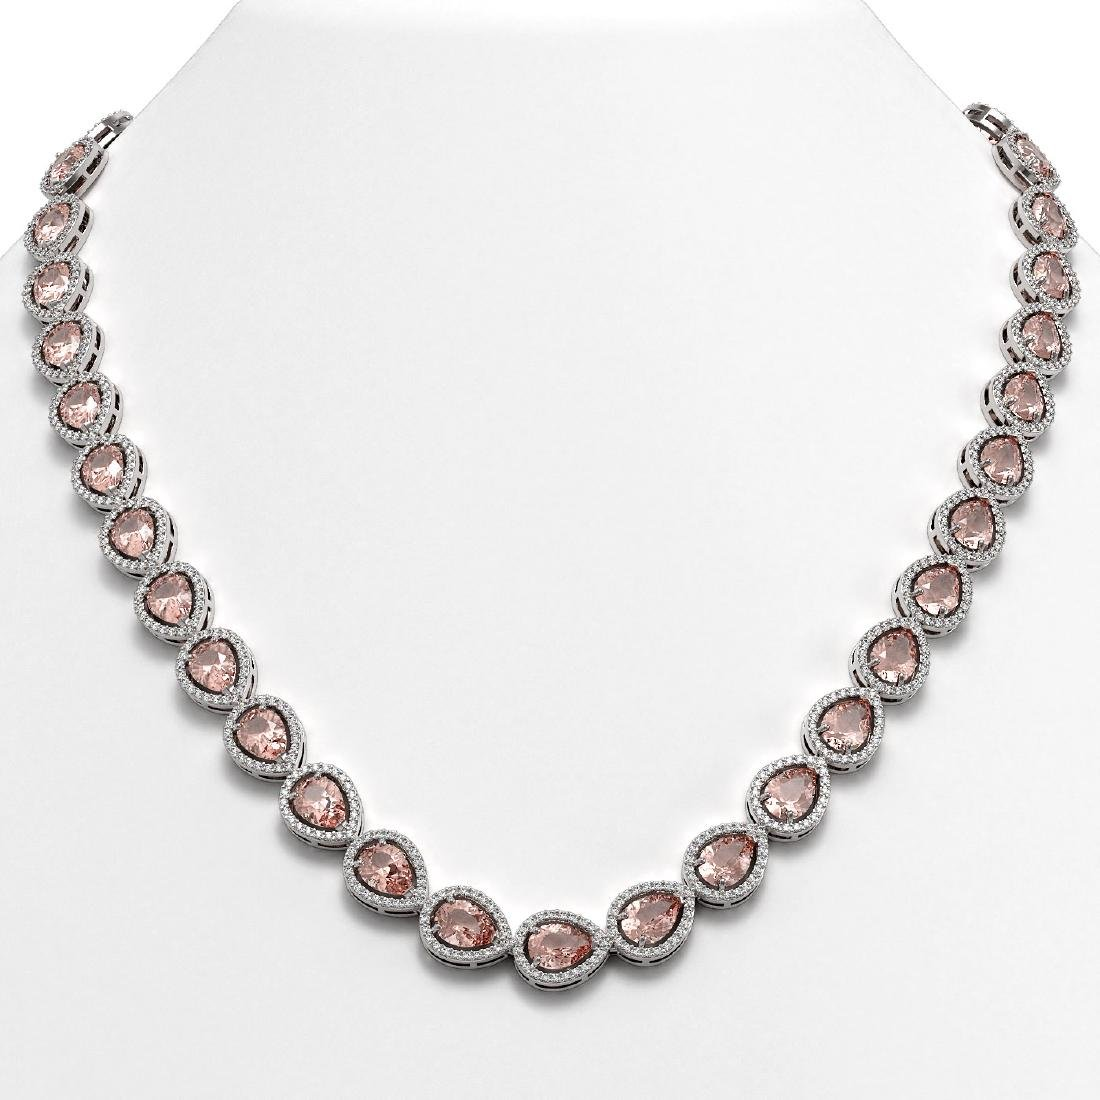 35.13 CTW Morganite & Diamond Halo Necklace 10K White